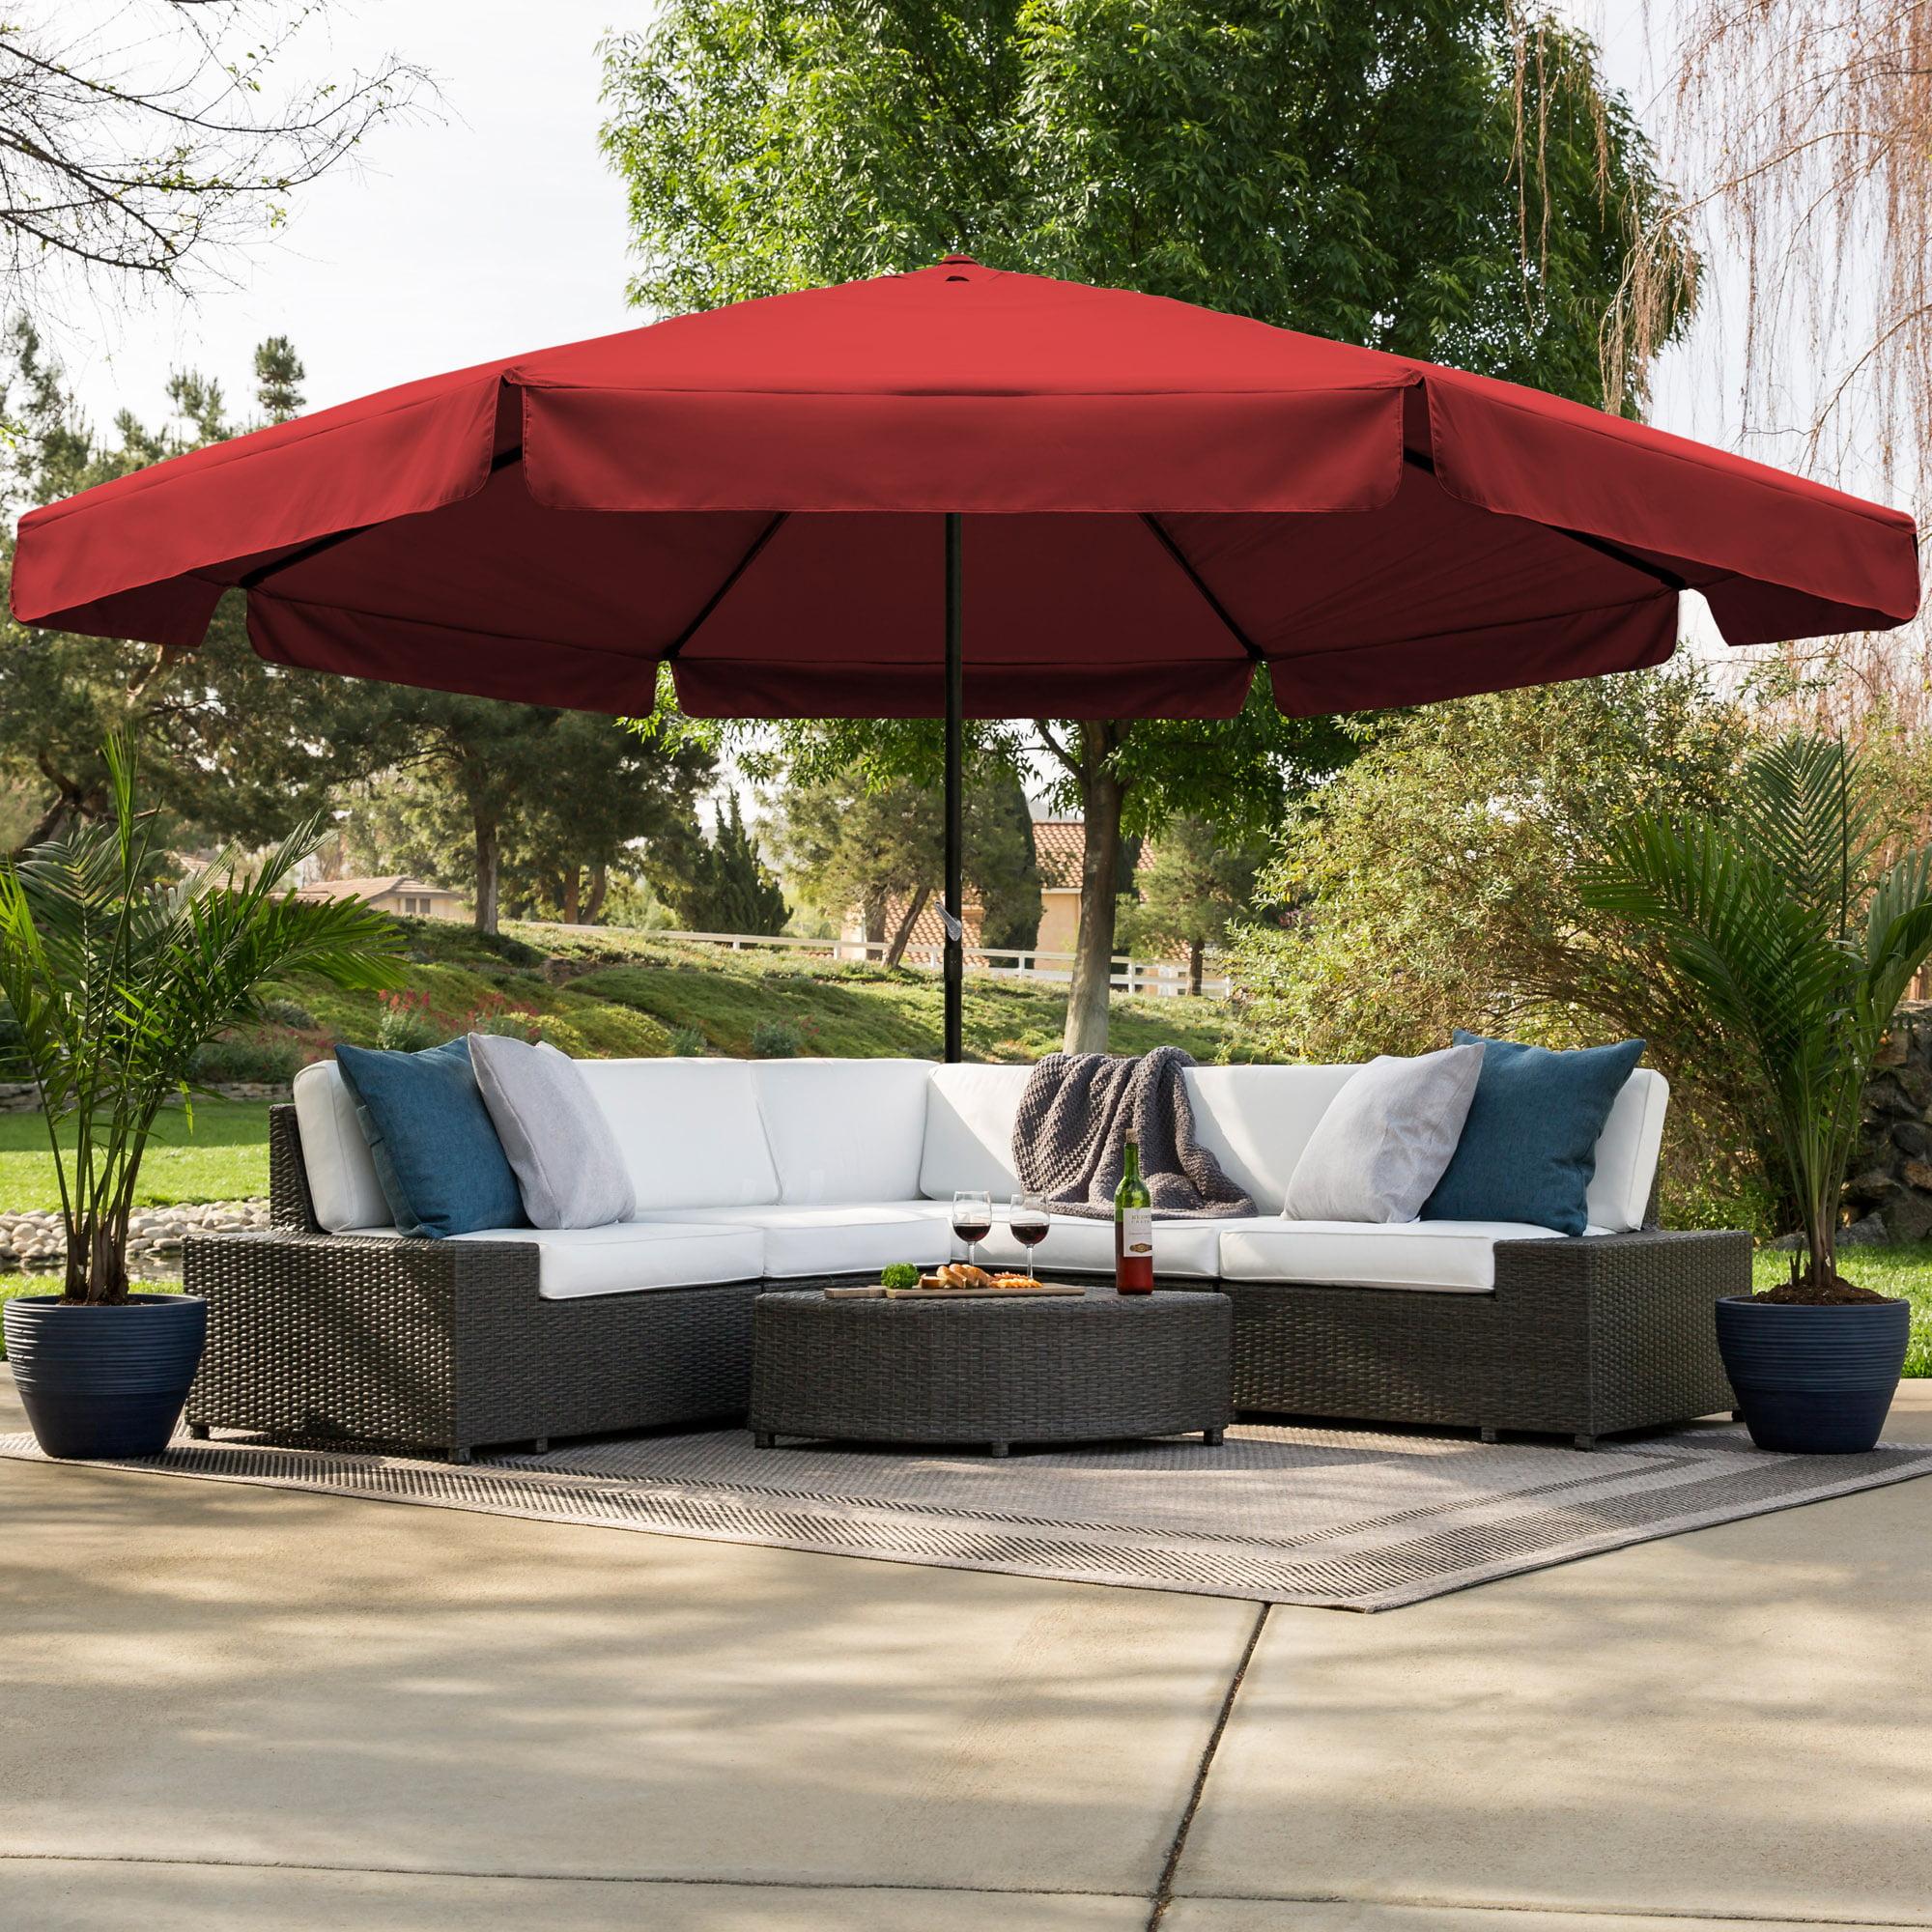 Best Choice Products 16ft Outdoor Patio Drape Canopy Market Umbrella w/ Cross Base, Crank, Air Vent - Burgundy